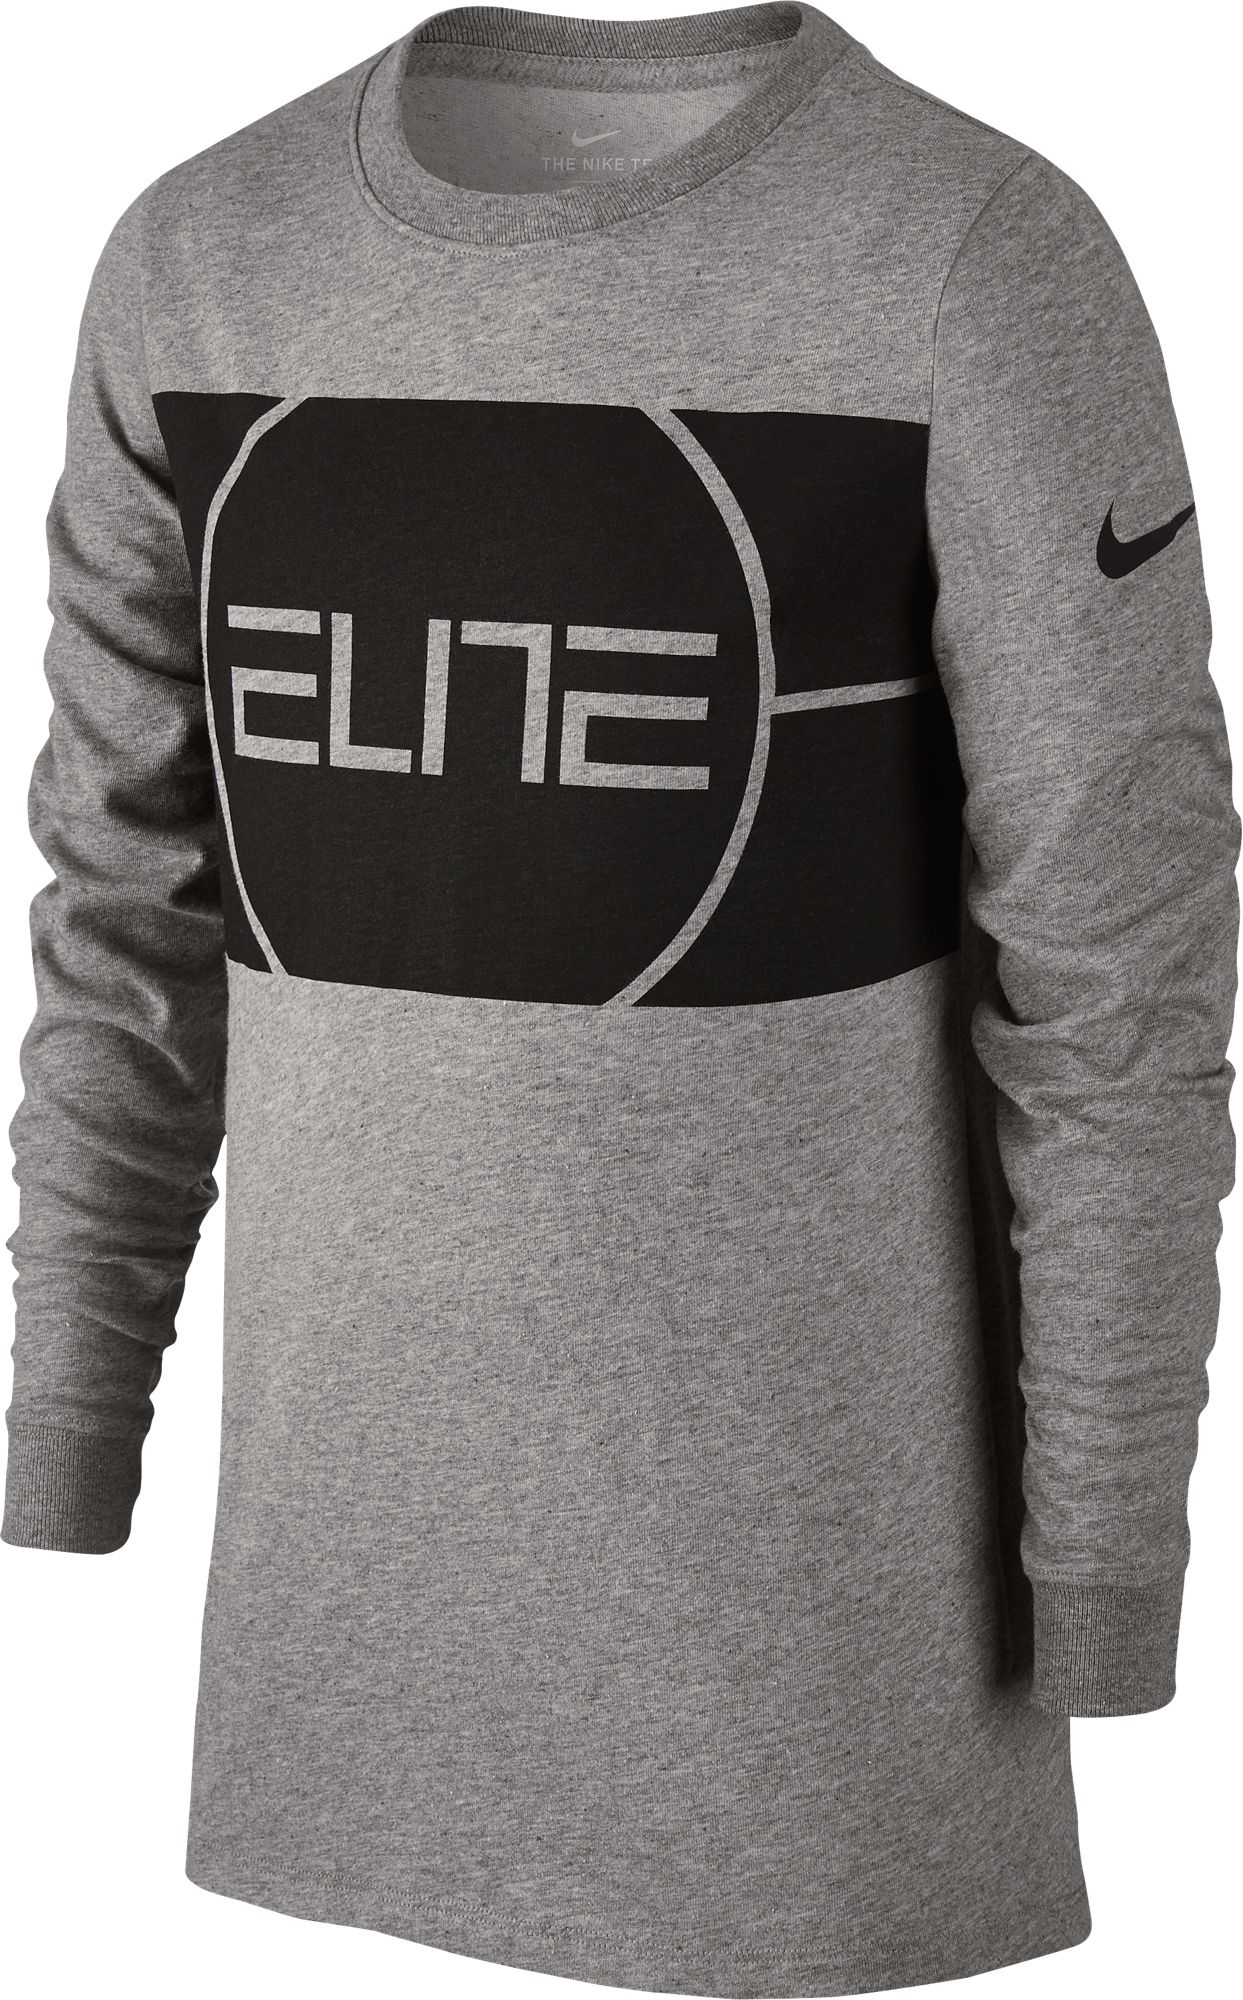 90cfdc795594 Nike Boys  Dry Elite Basketball Long Sleeve T-shirt (Dark Gray Heather